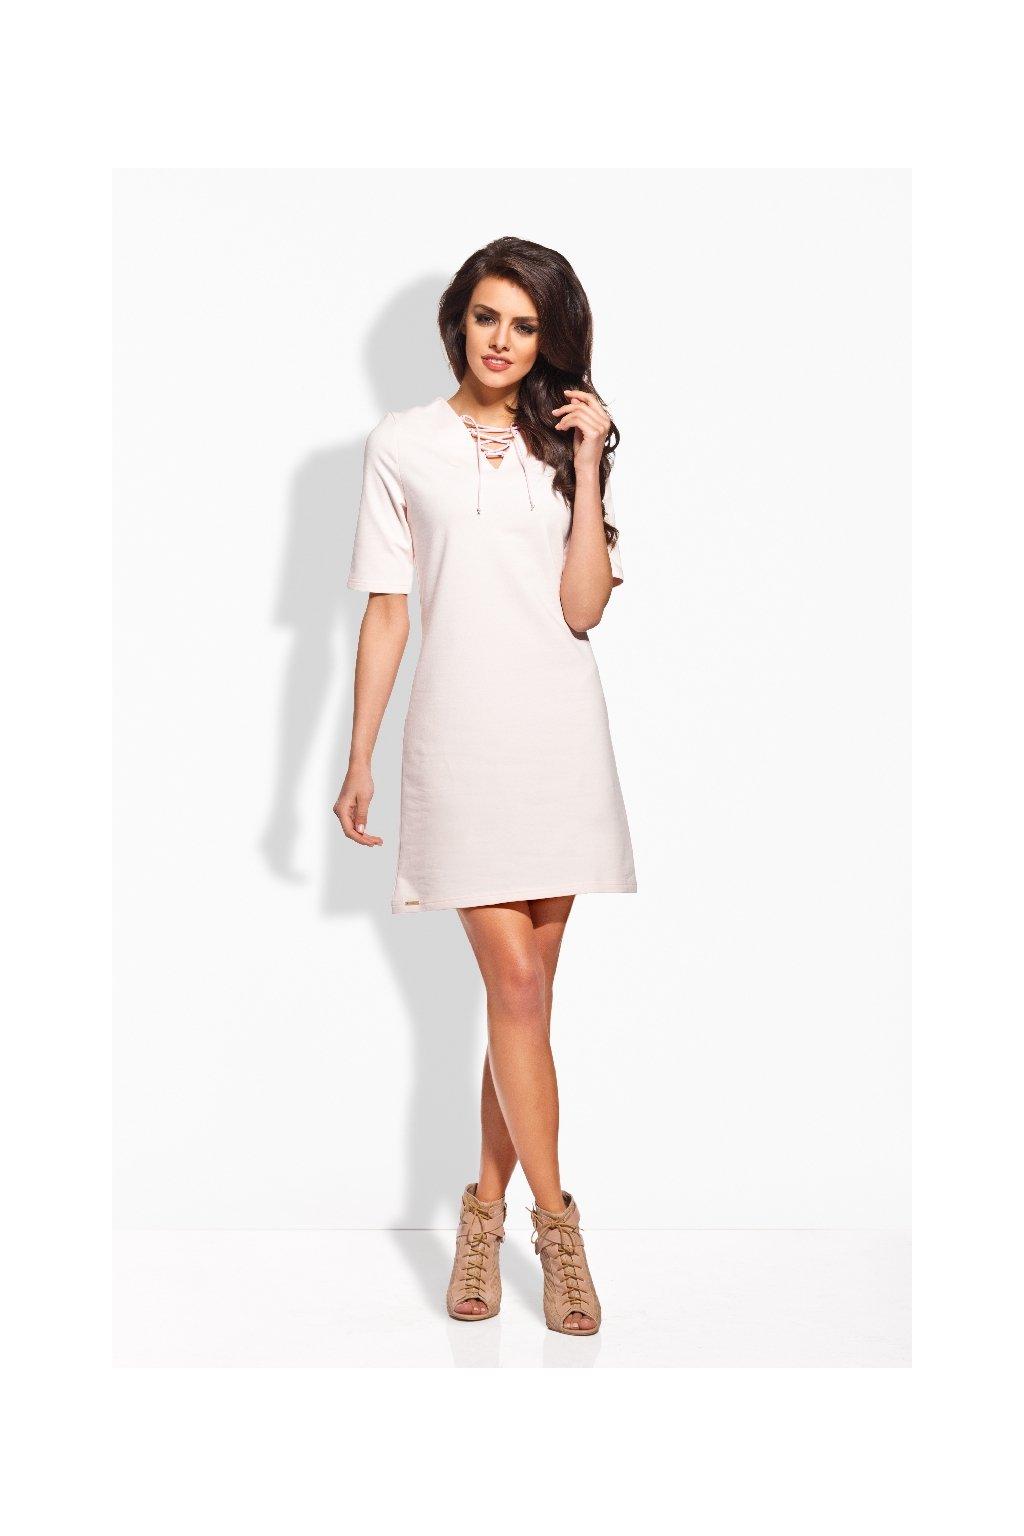 Dámské šaty Lemoniade L120 růžové